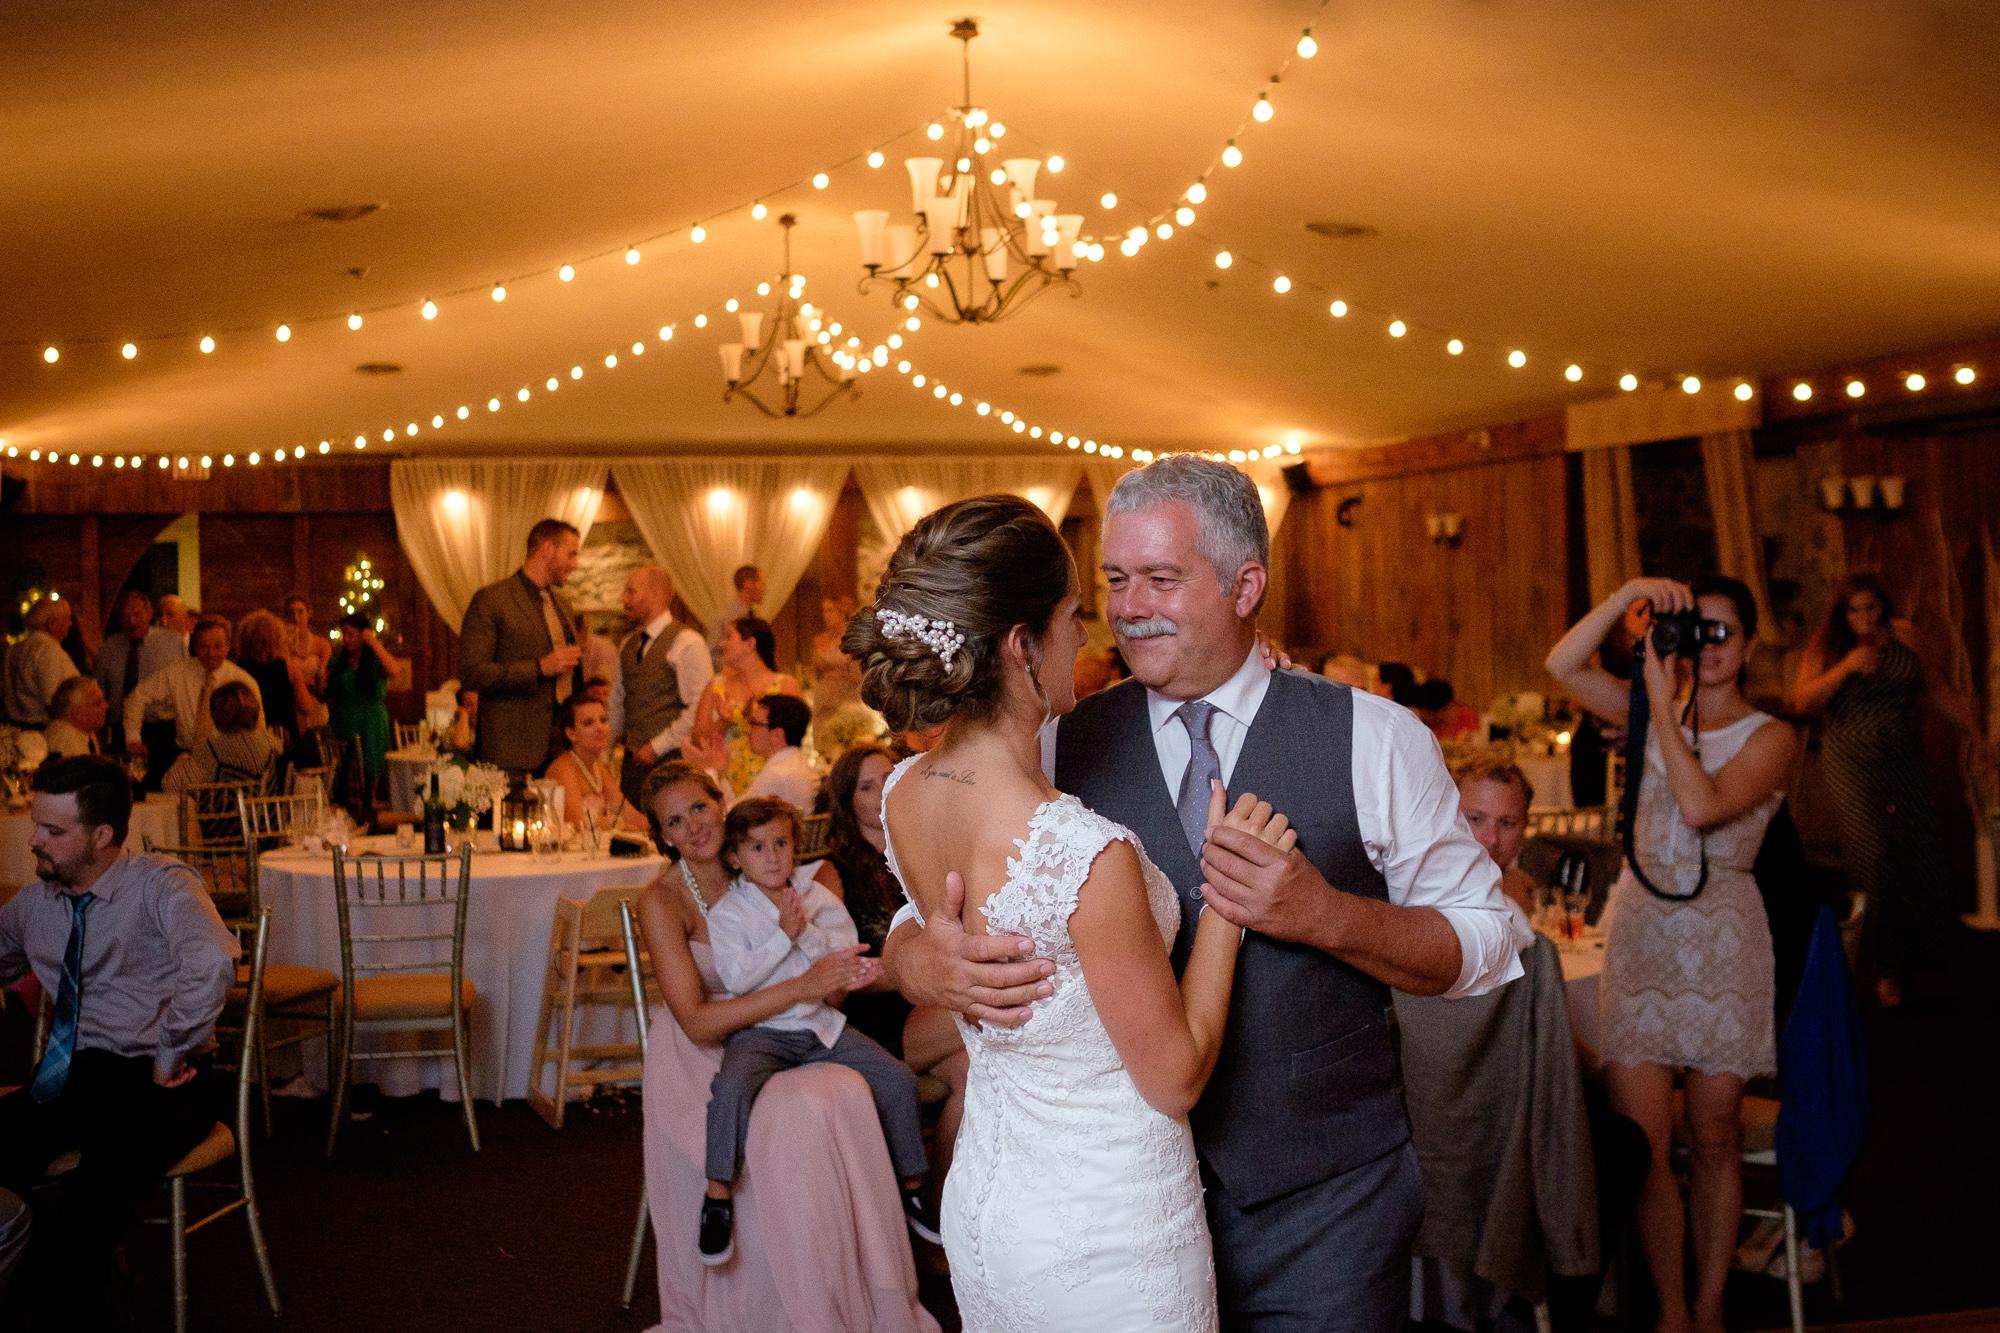 hessenland-inn-wedding-001.jpg